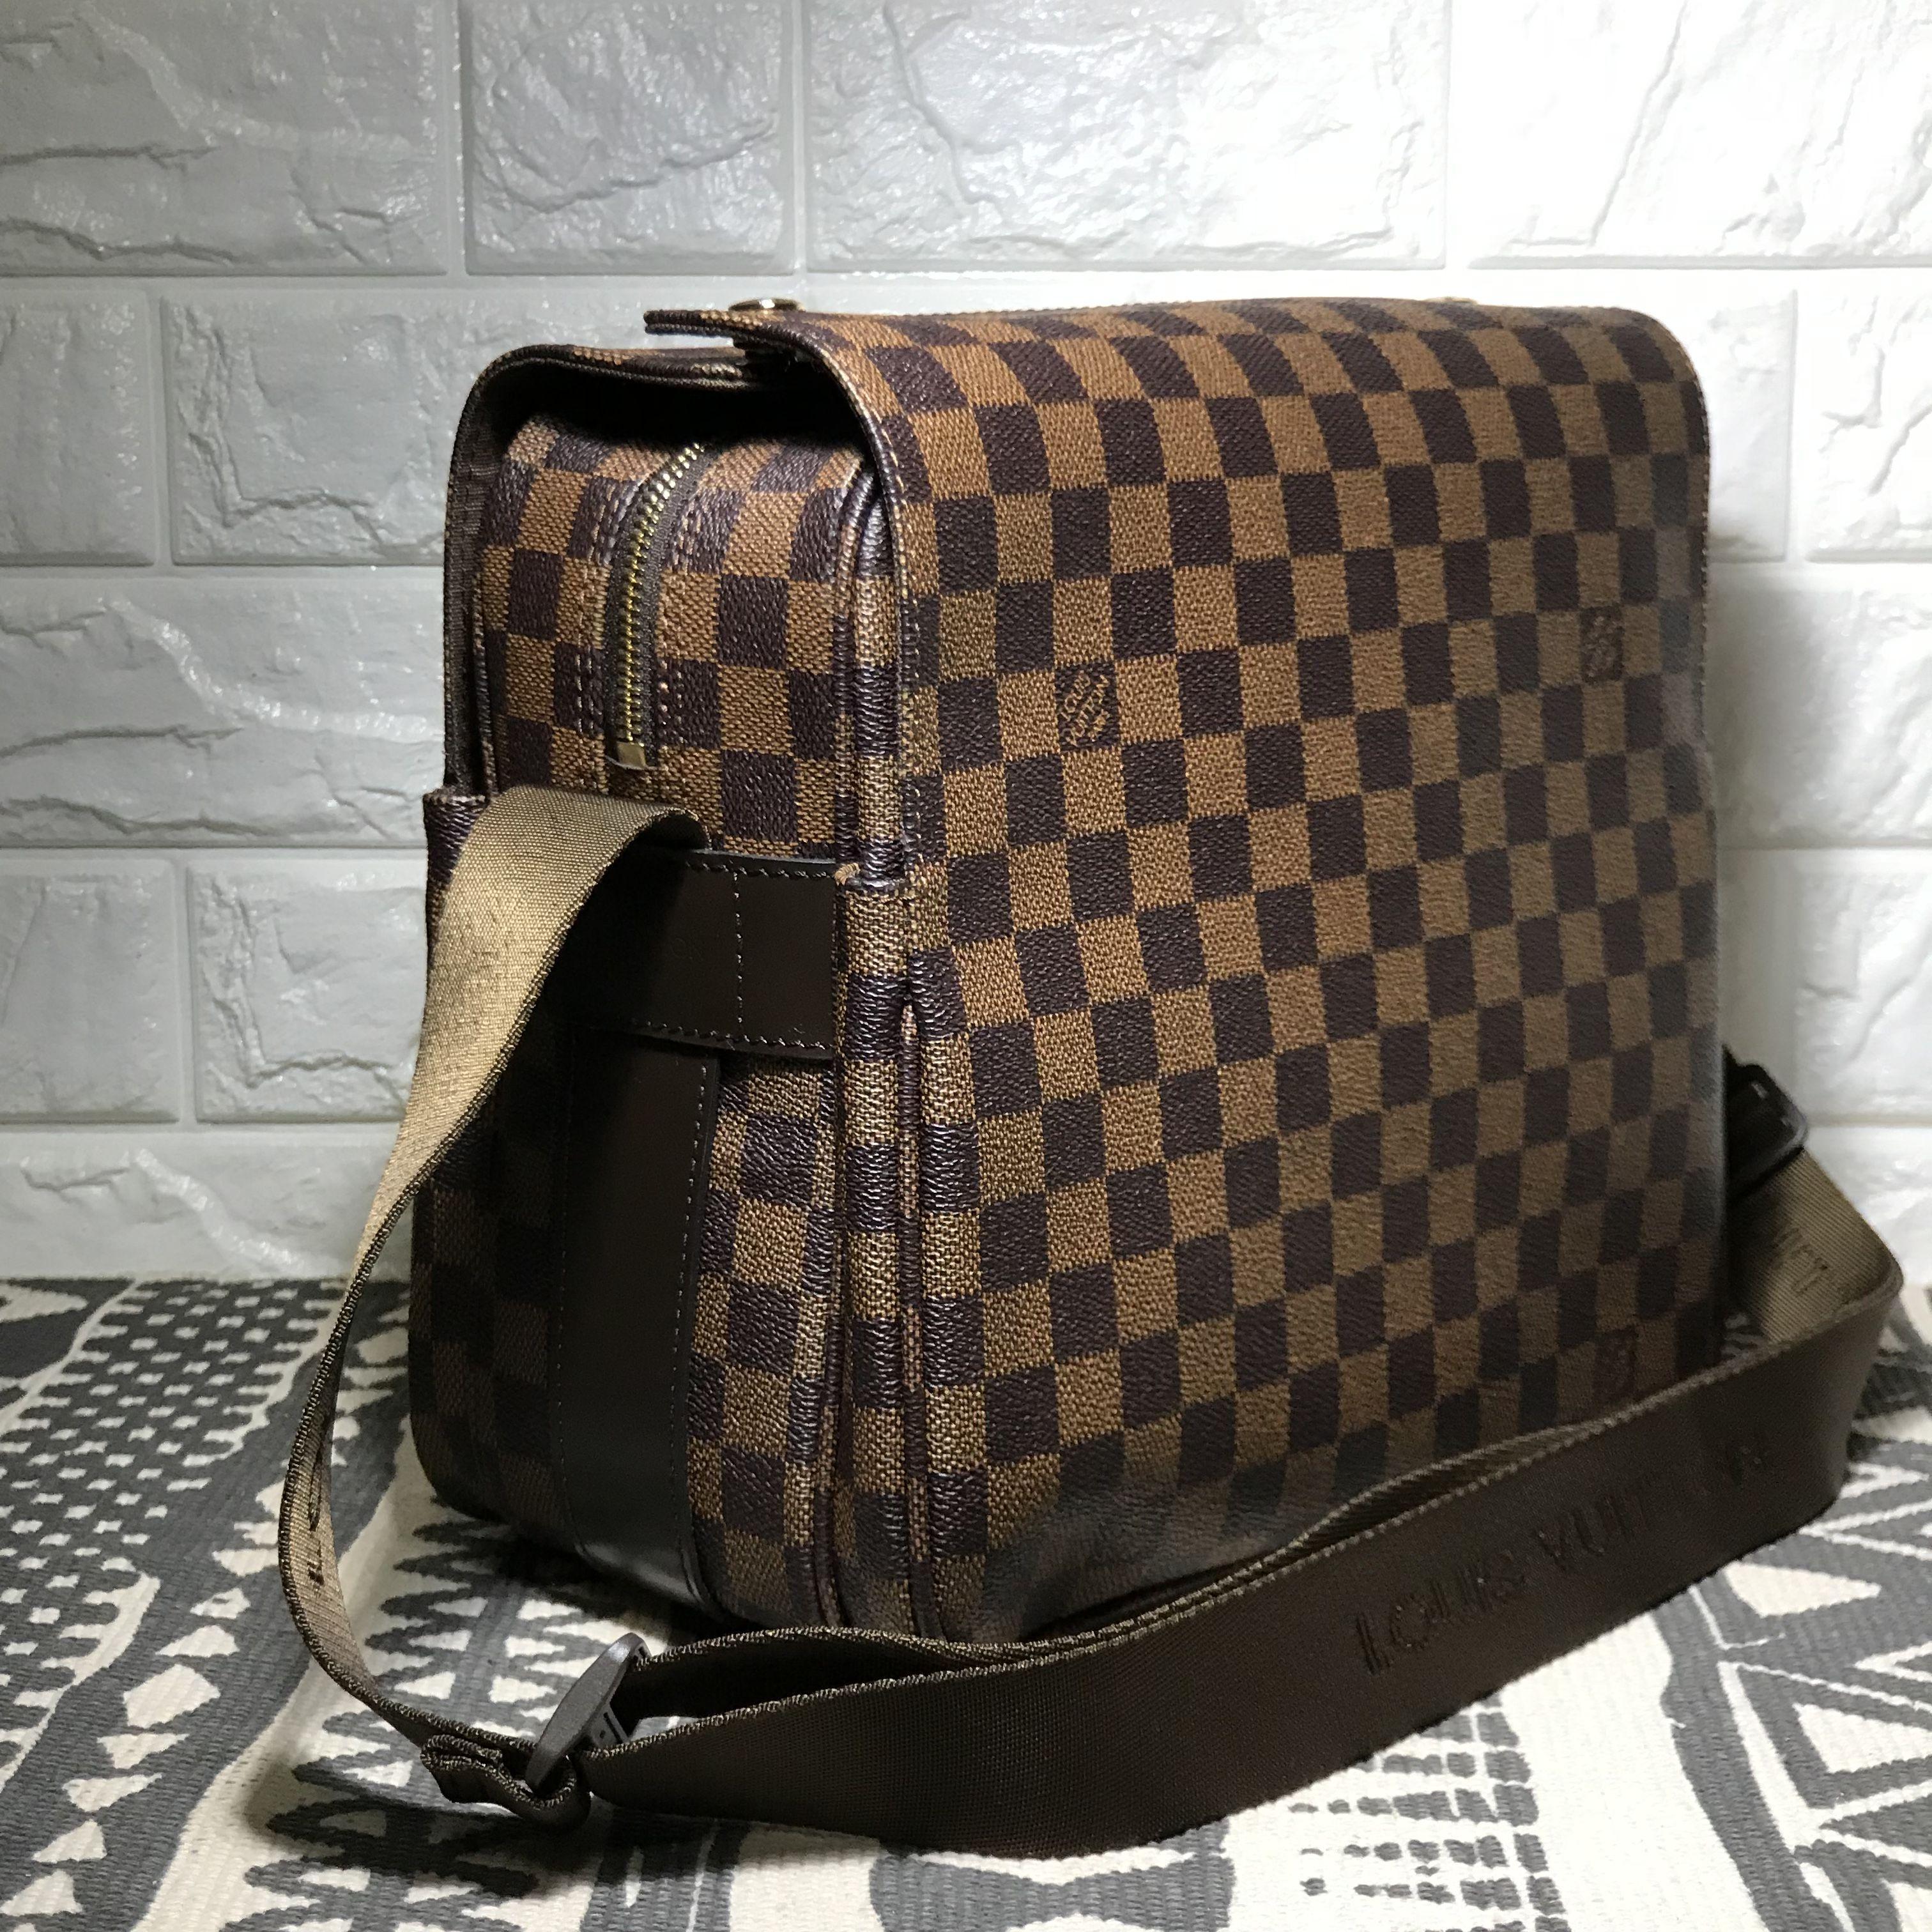 b1ab2d8c7367 Louis Vuitton lv man messenger bag Damier ebene